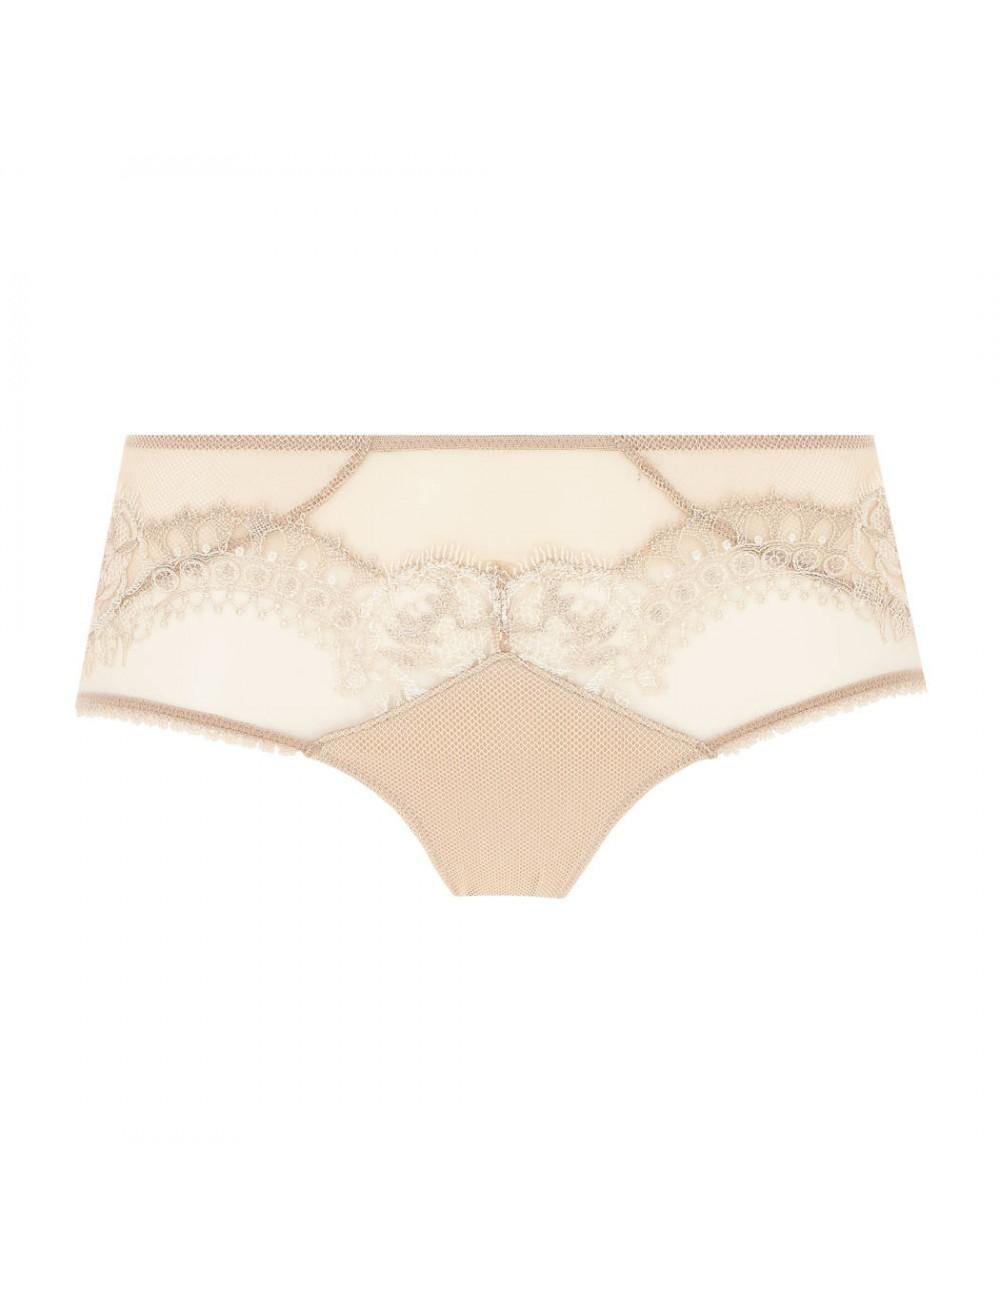 Lise Charmel Ecrin Glamour Culotte sexy